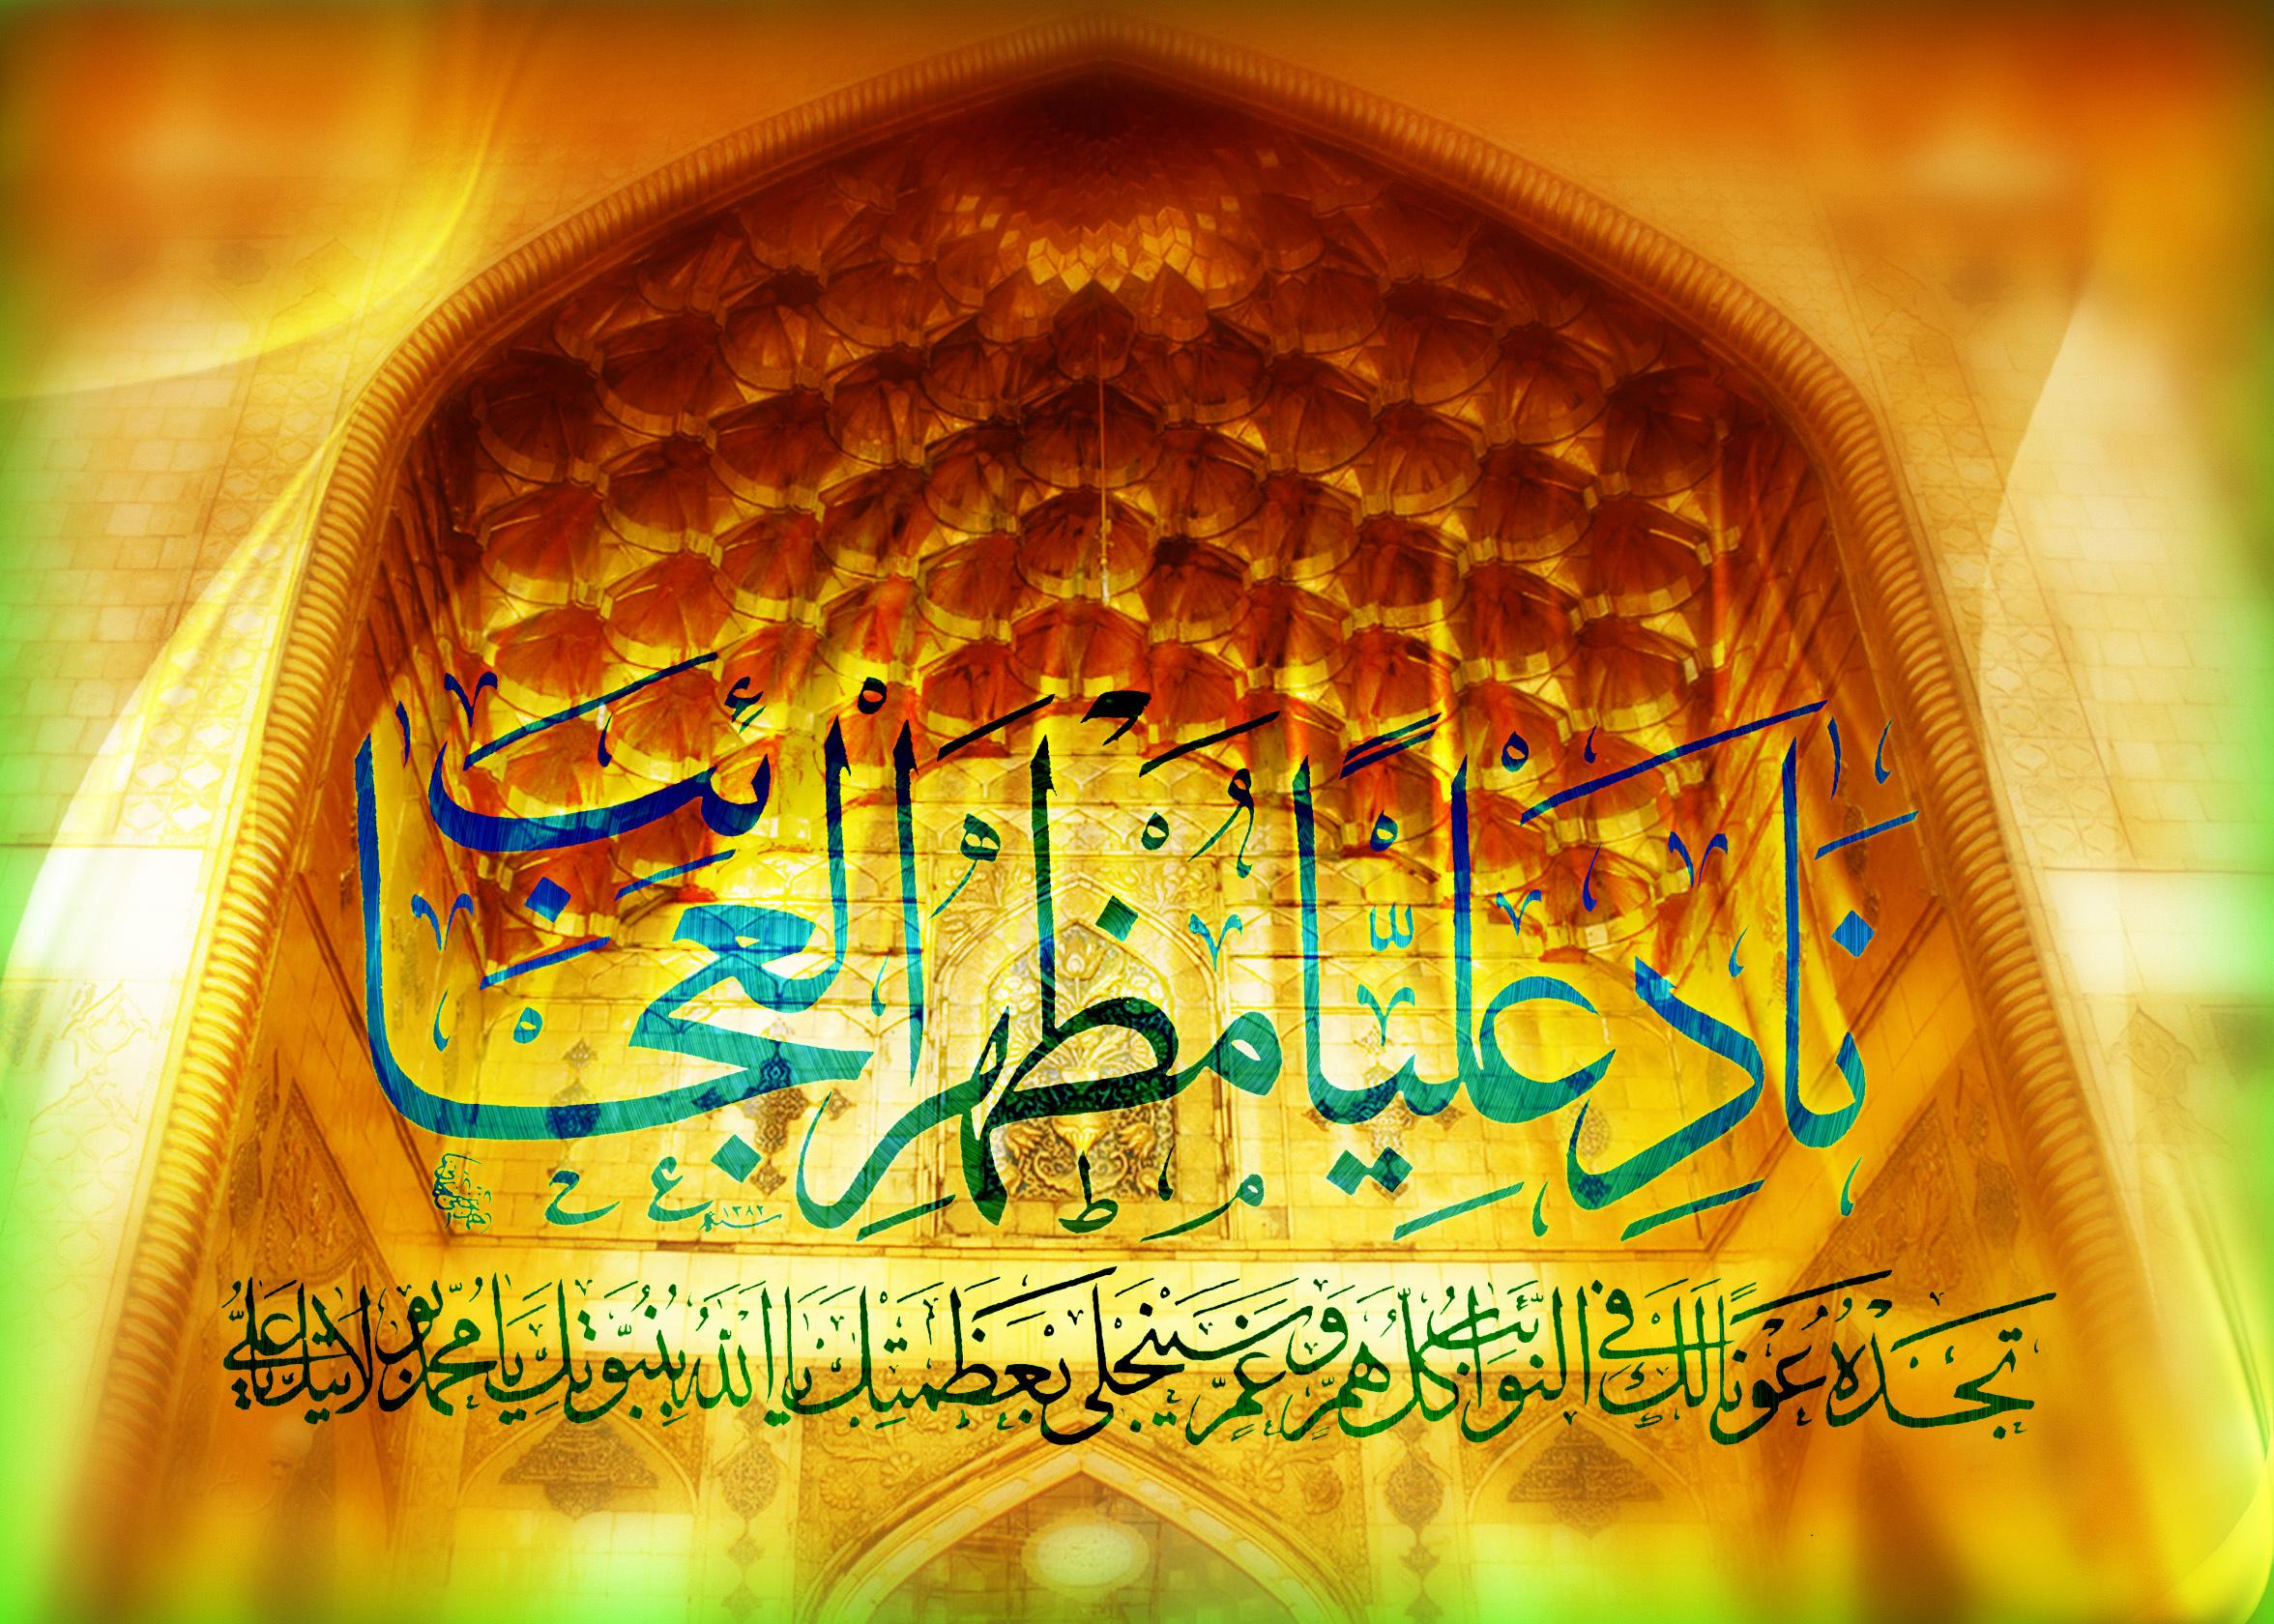 http://mellate-ebrahim.persiangig.com/image/91/03/imam-ali/imam-ali-2.jpg